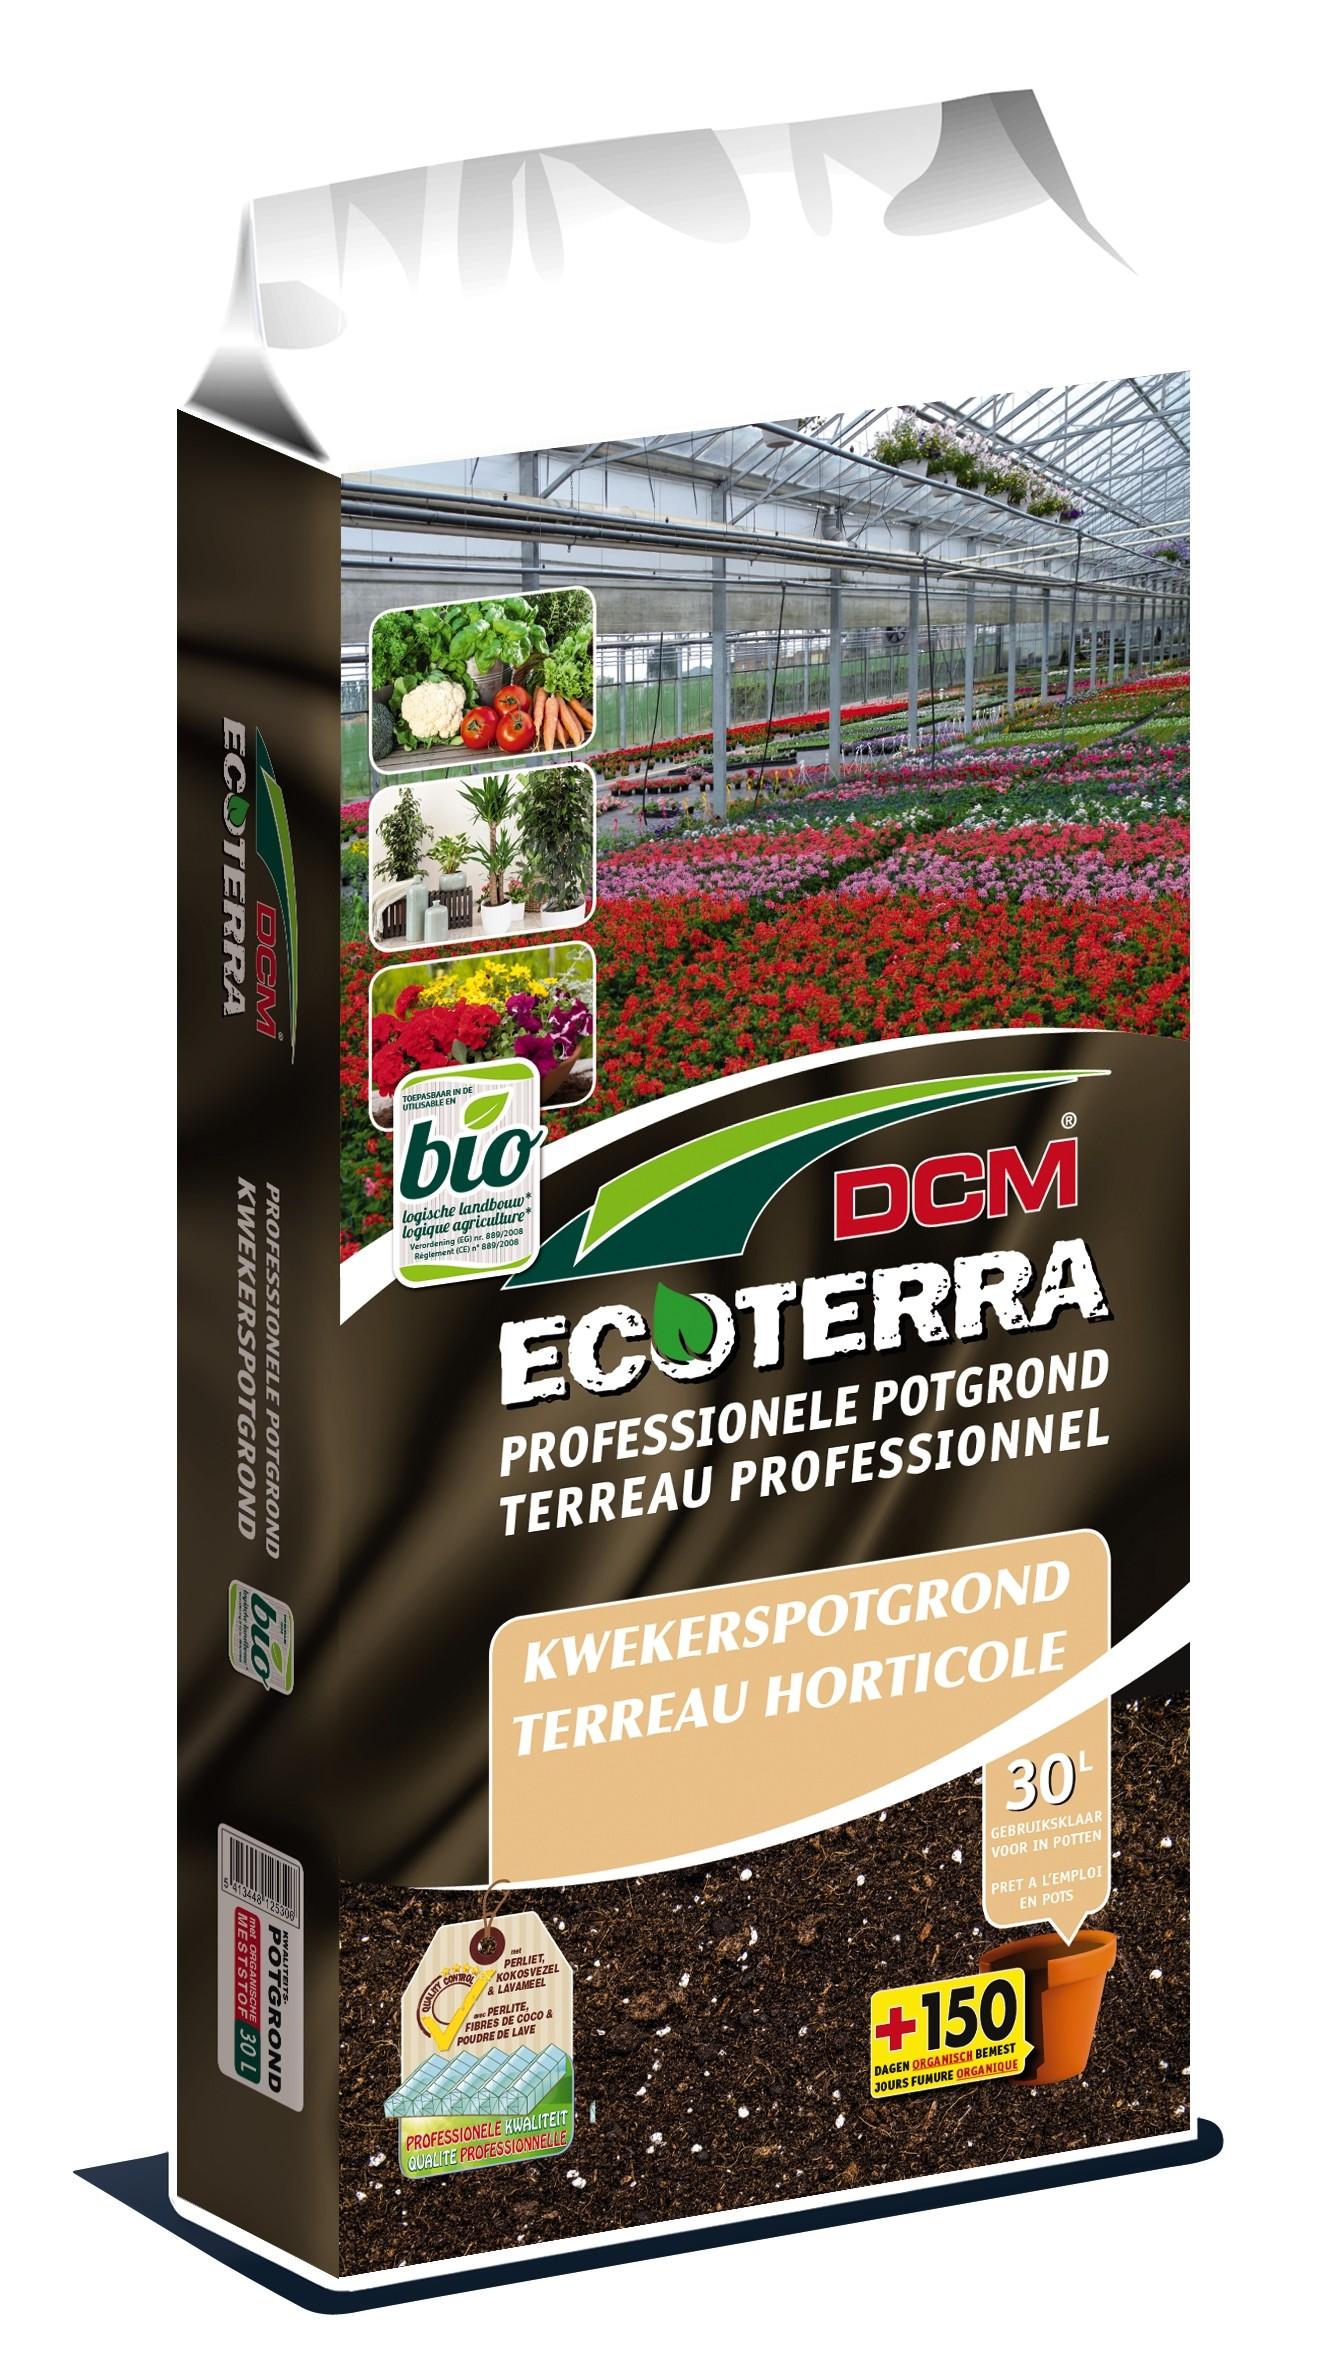 Ecoterra Kwekerspotgrond